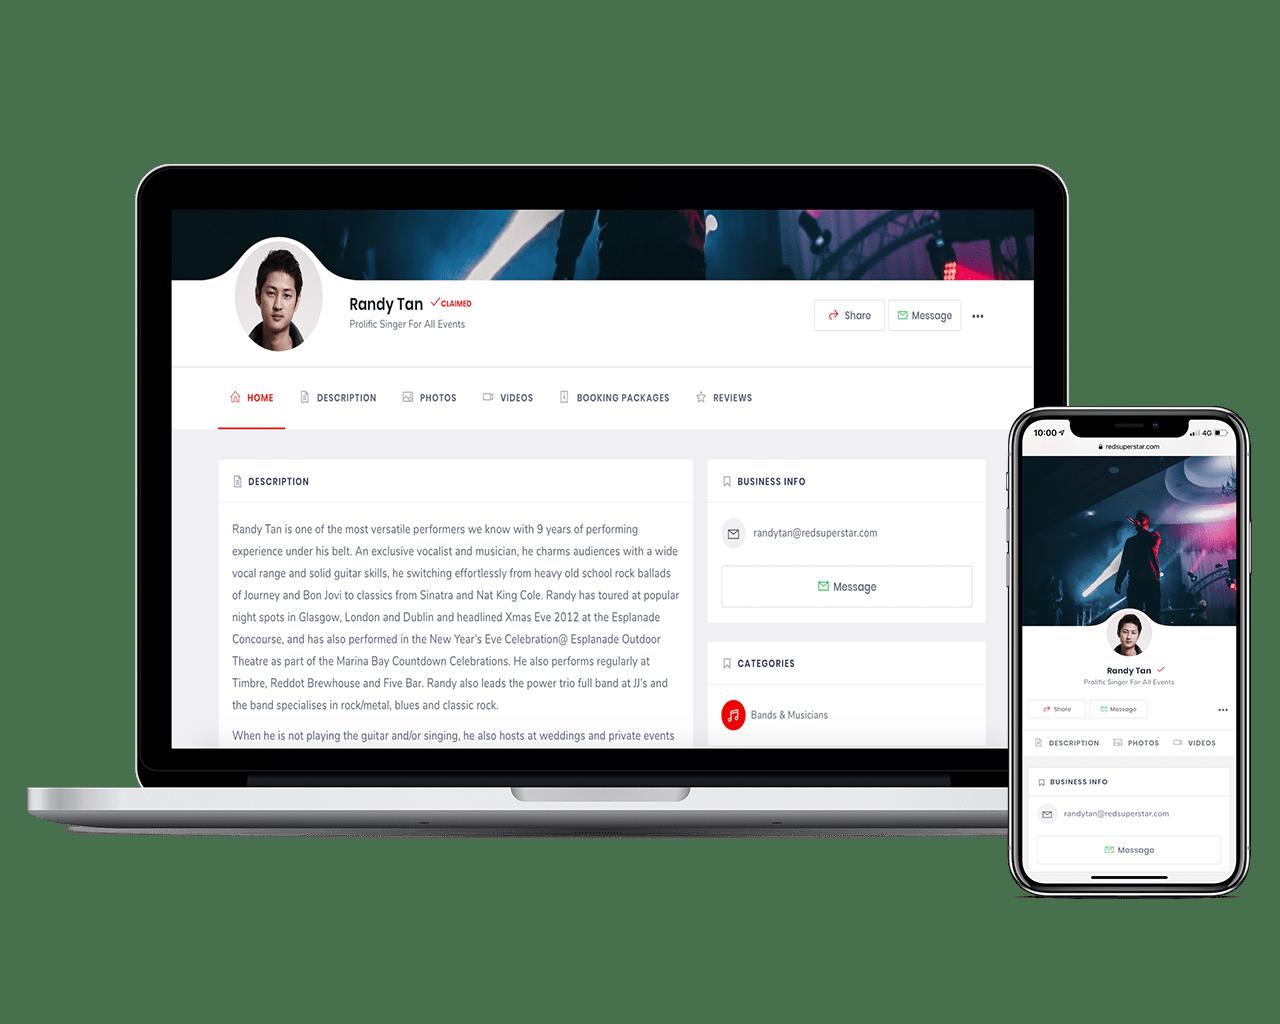 redsuperstar-online-profile